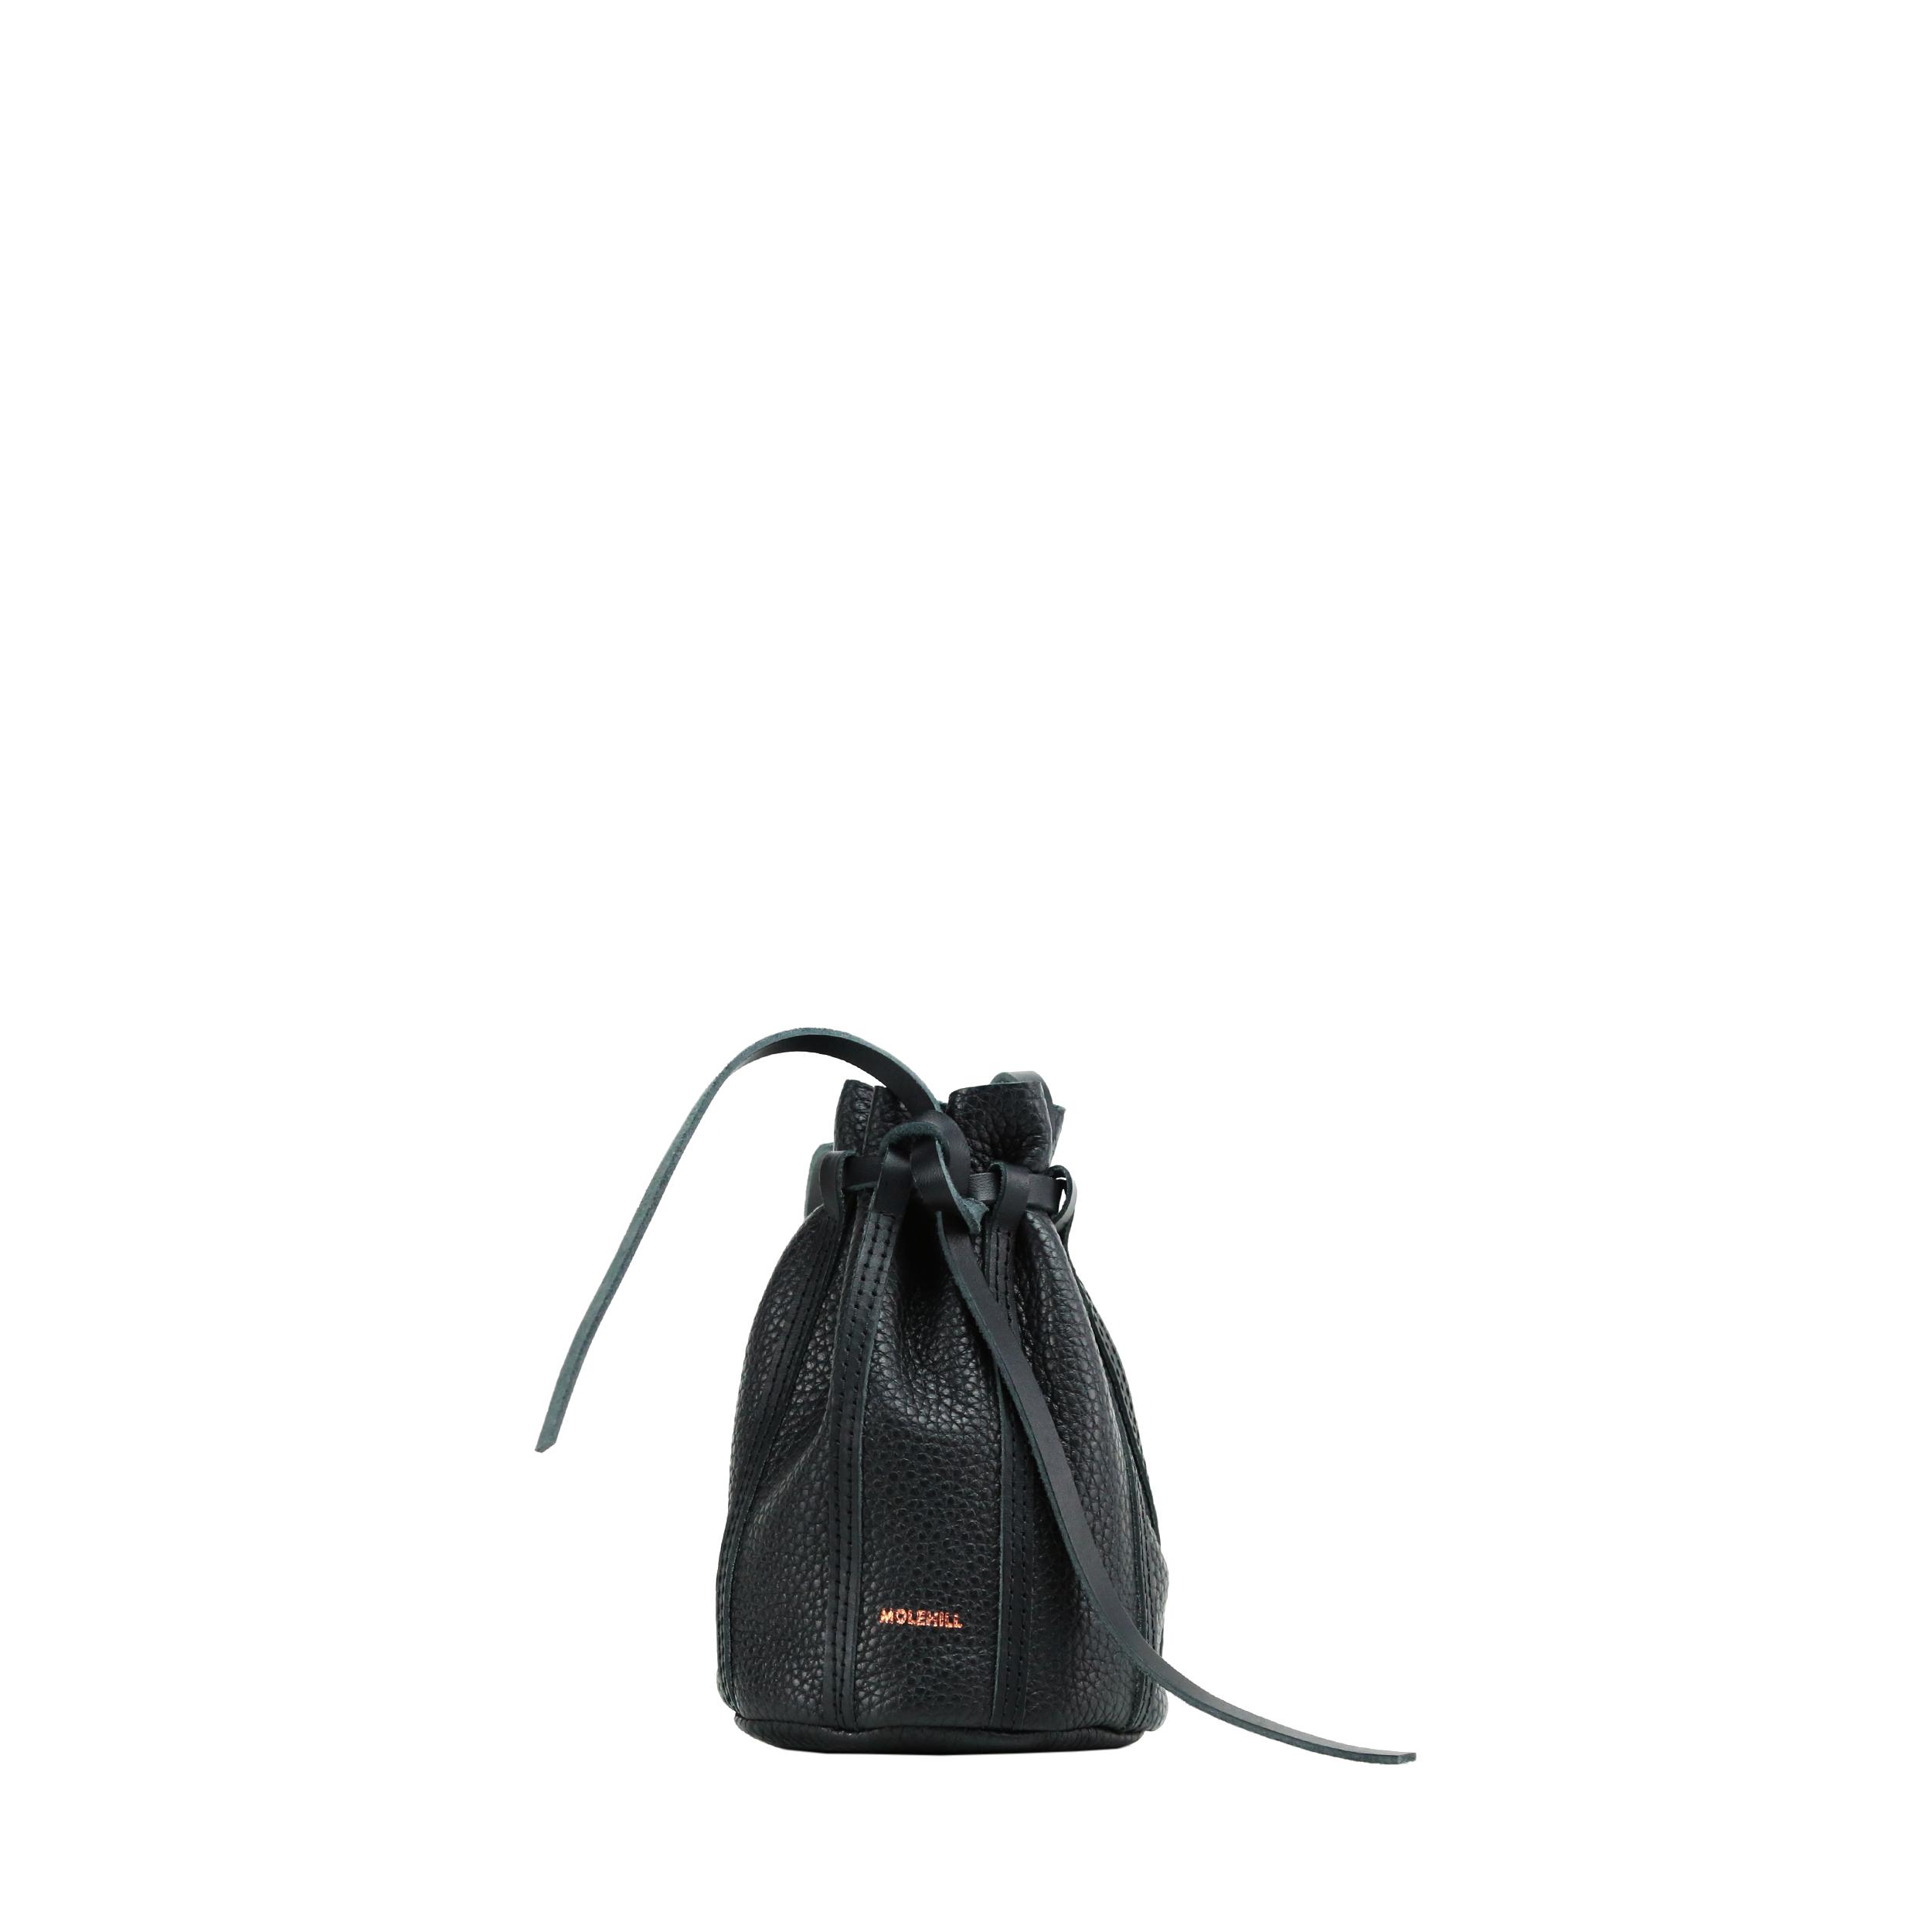 Torba-Olio-Bucket-Bag-Black-Micro-1